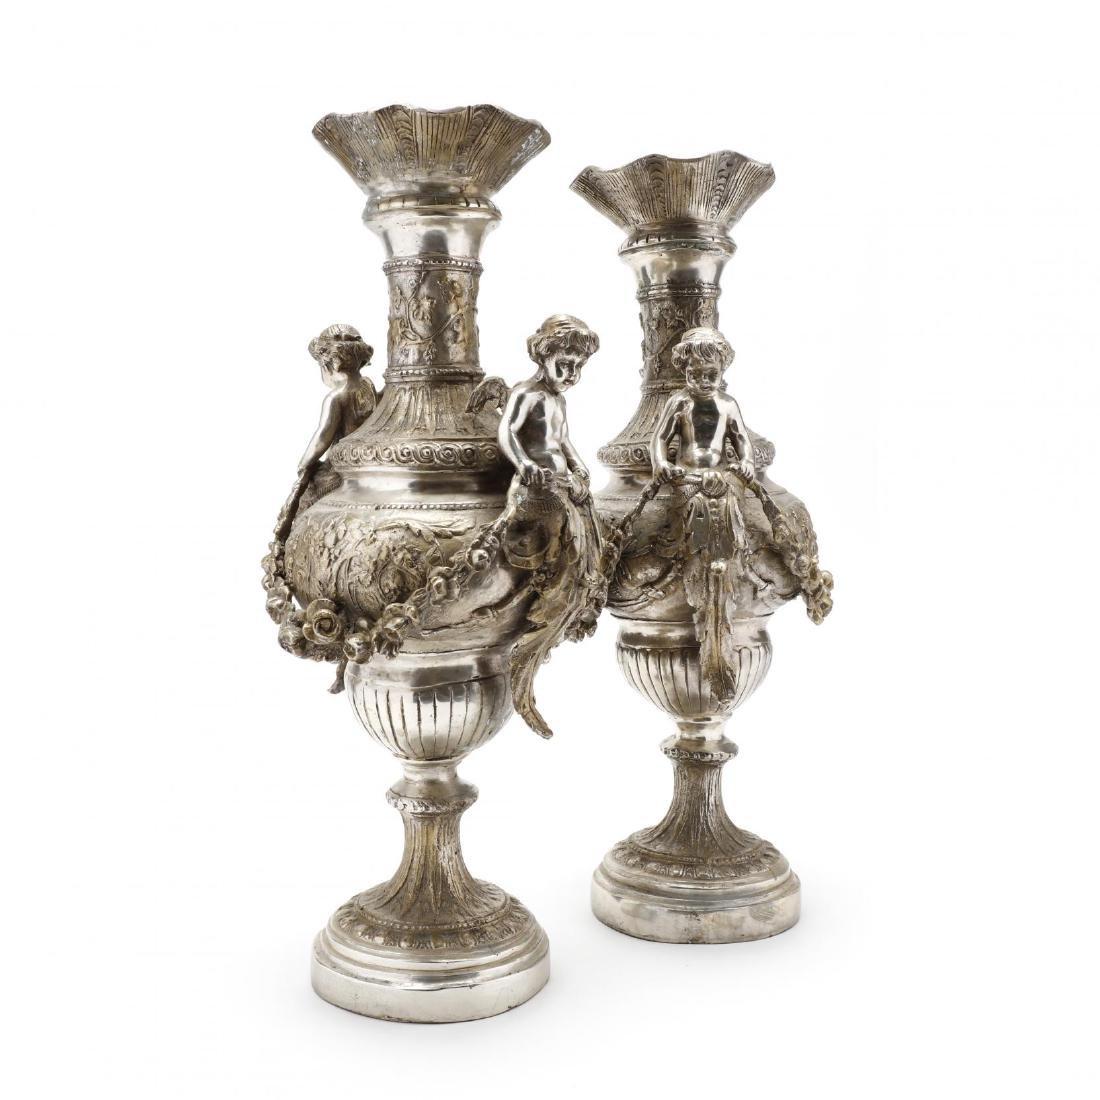 A Pair of Silvertone Renaissance Revival Style Urns - 5